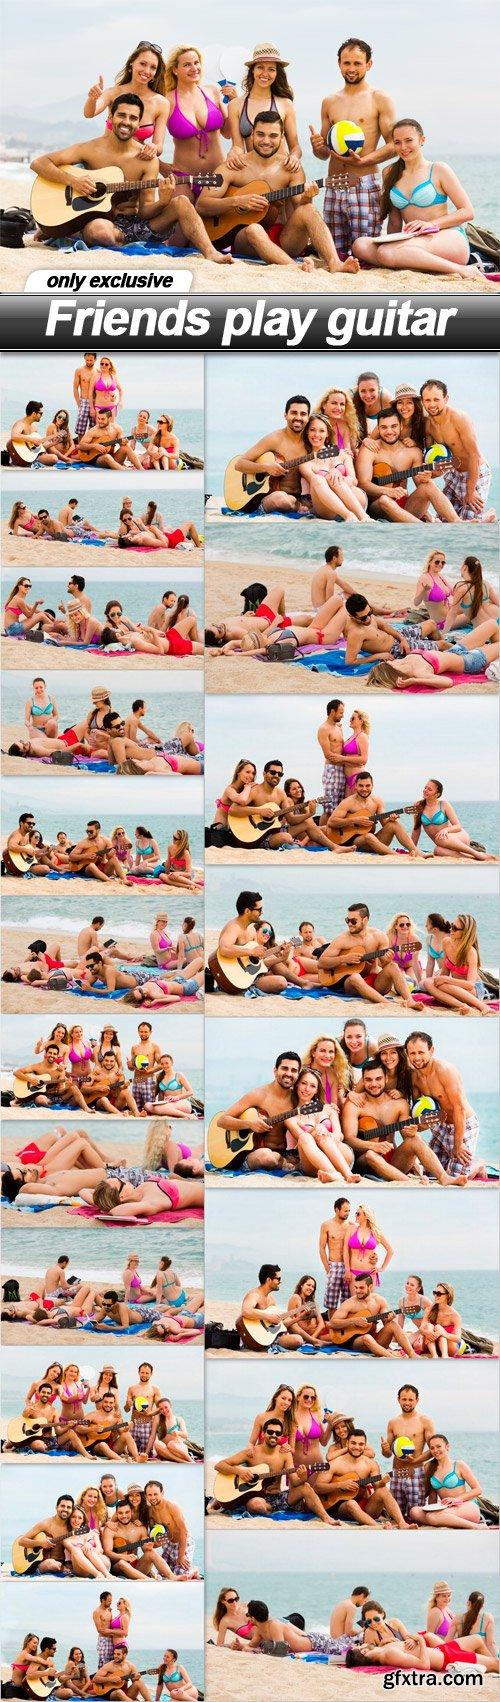 Friends play guitar - 20 UHQ JPEG